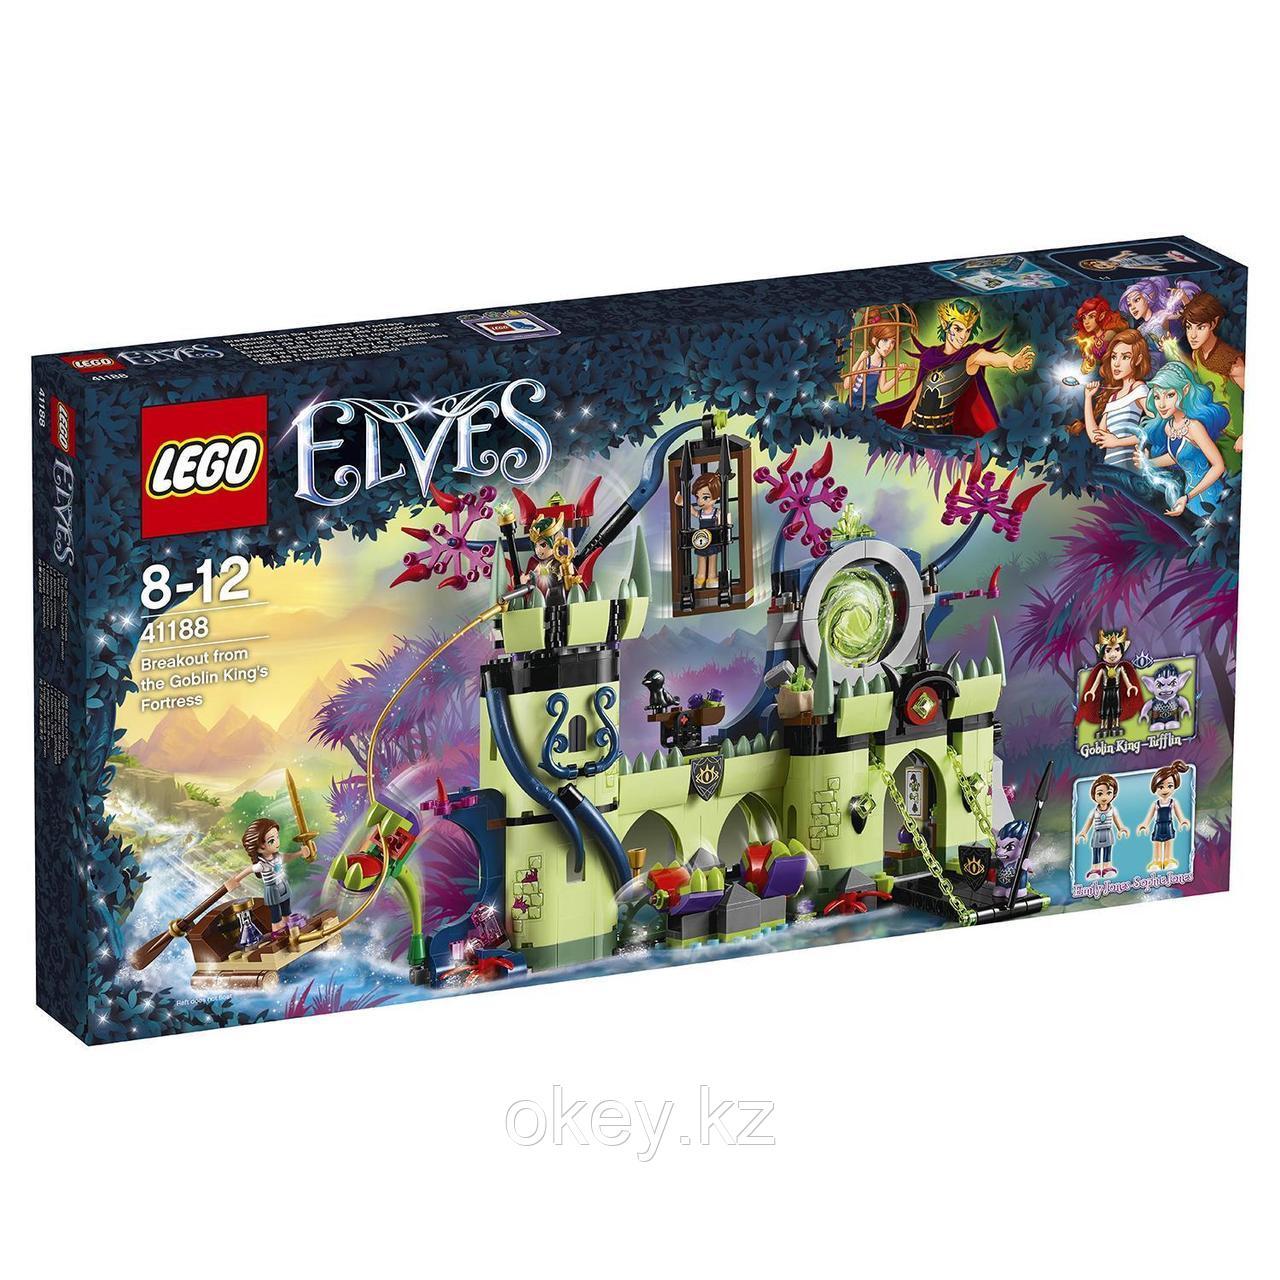 LEGO Elves: Побег из крепости Короля гоблинов 41188 - фото 1